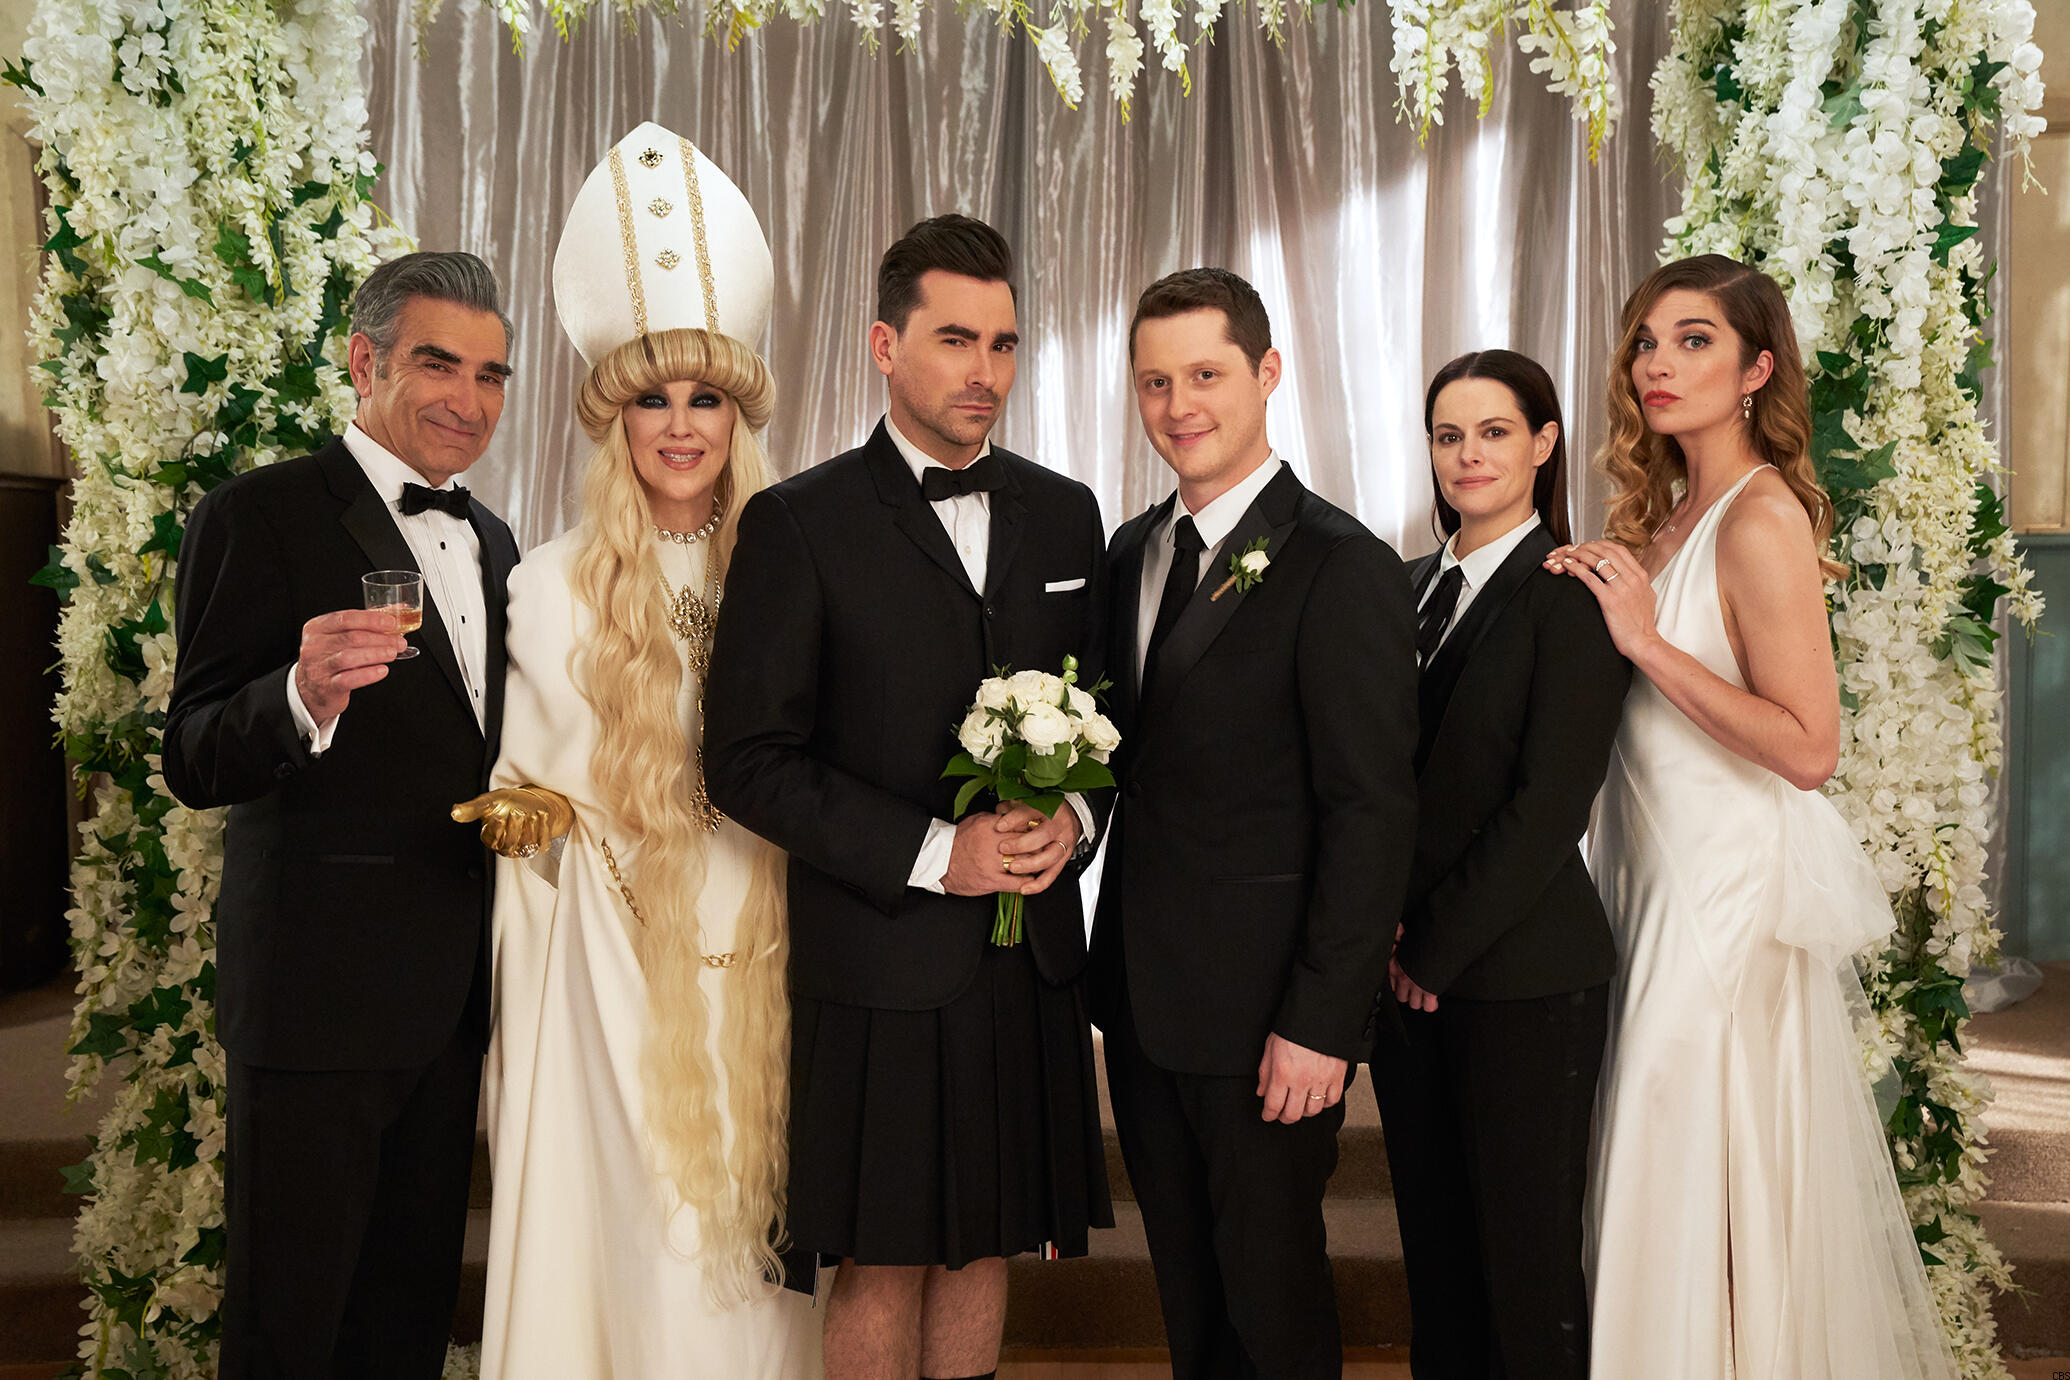 schitts-creek-finale-wedding-news.jpg